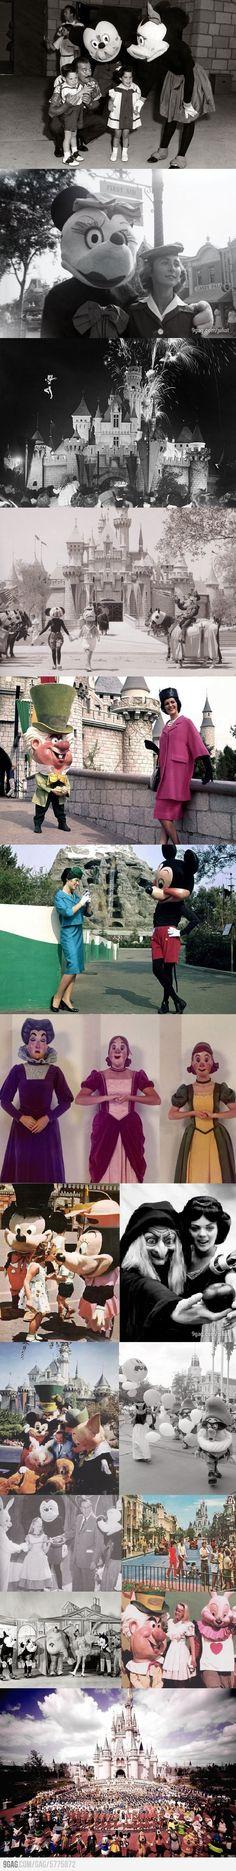 Old photos from Disneyland & Walt Disney World Disney Parks, Walt Disney, Disney Nerd, Disney Theme, Disney Love, Disney Fanatic, Disney Addict, Disney And Dreamworks, Disney Pixar